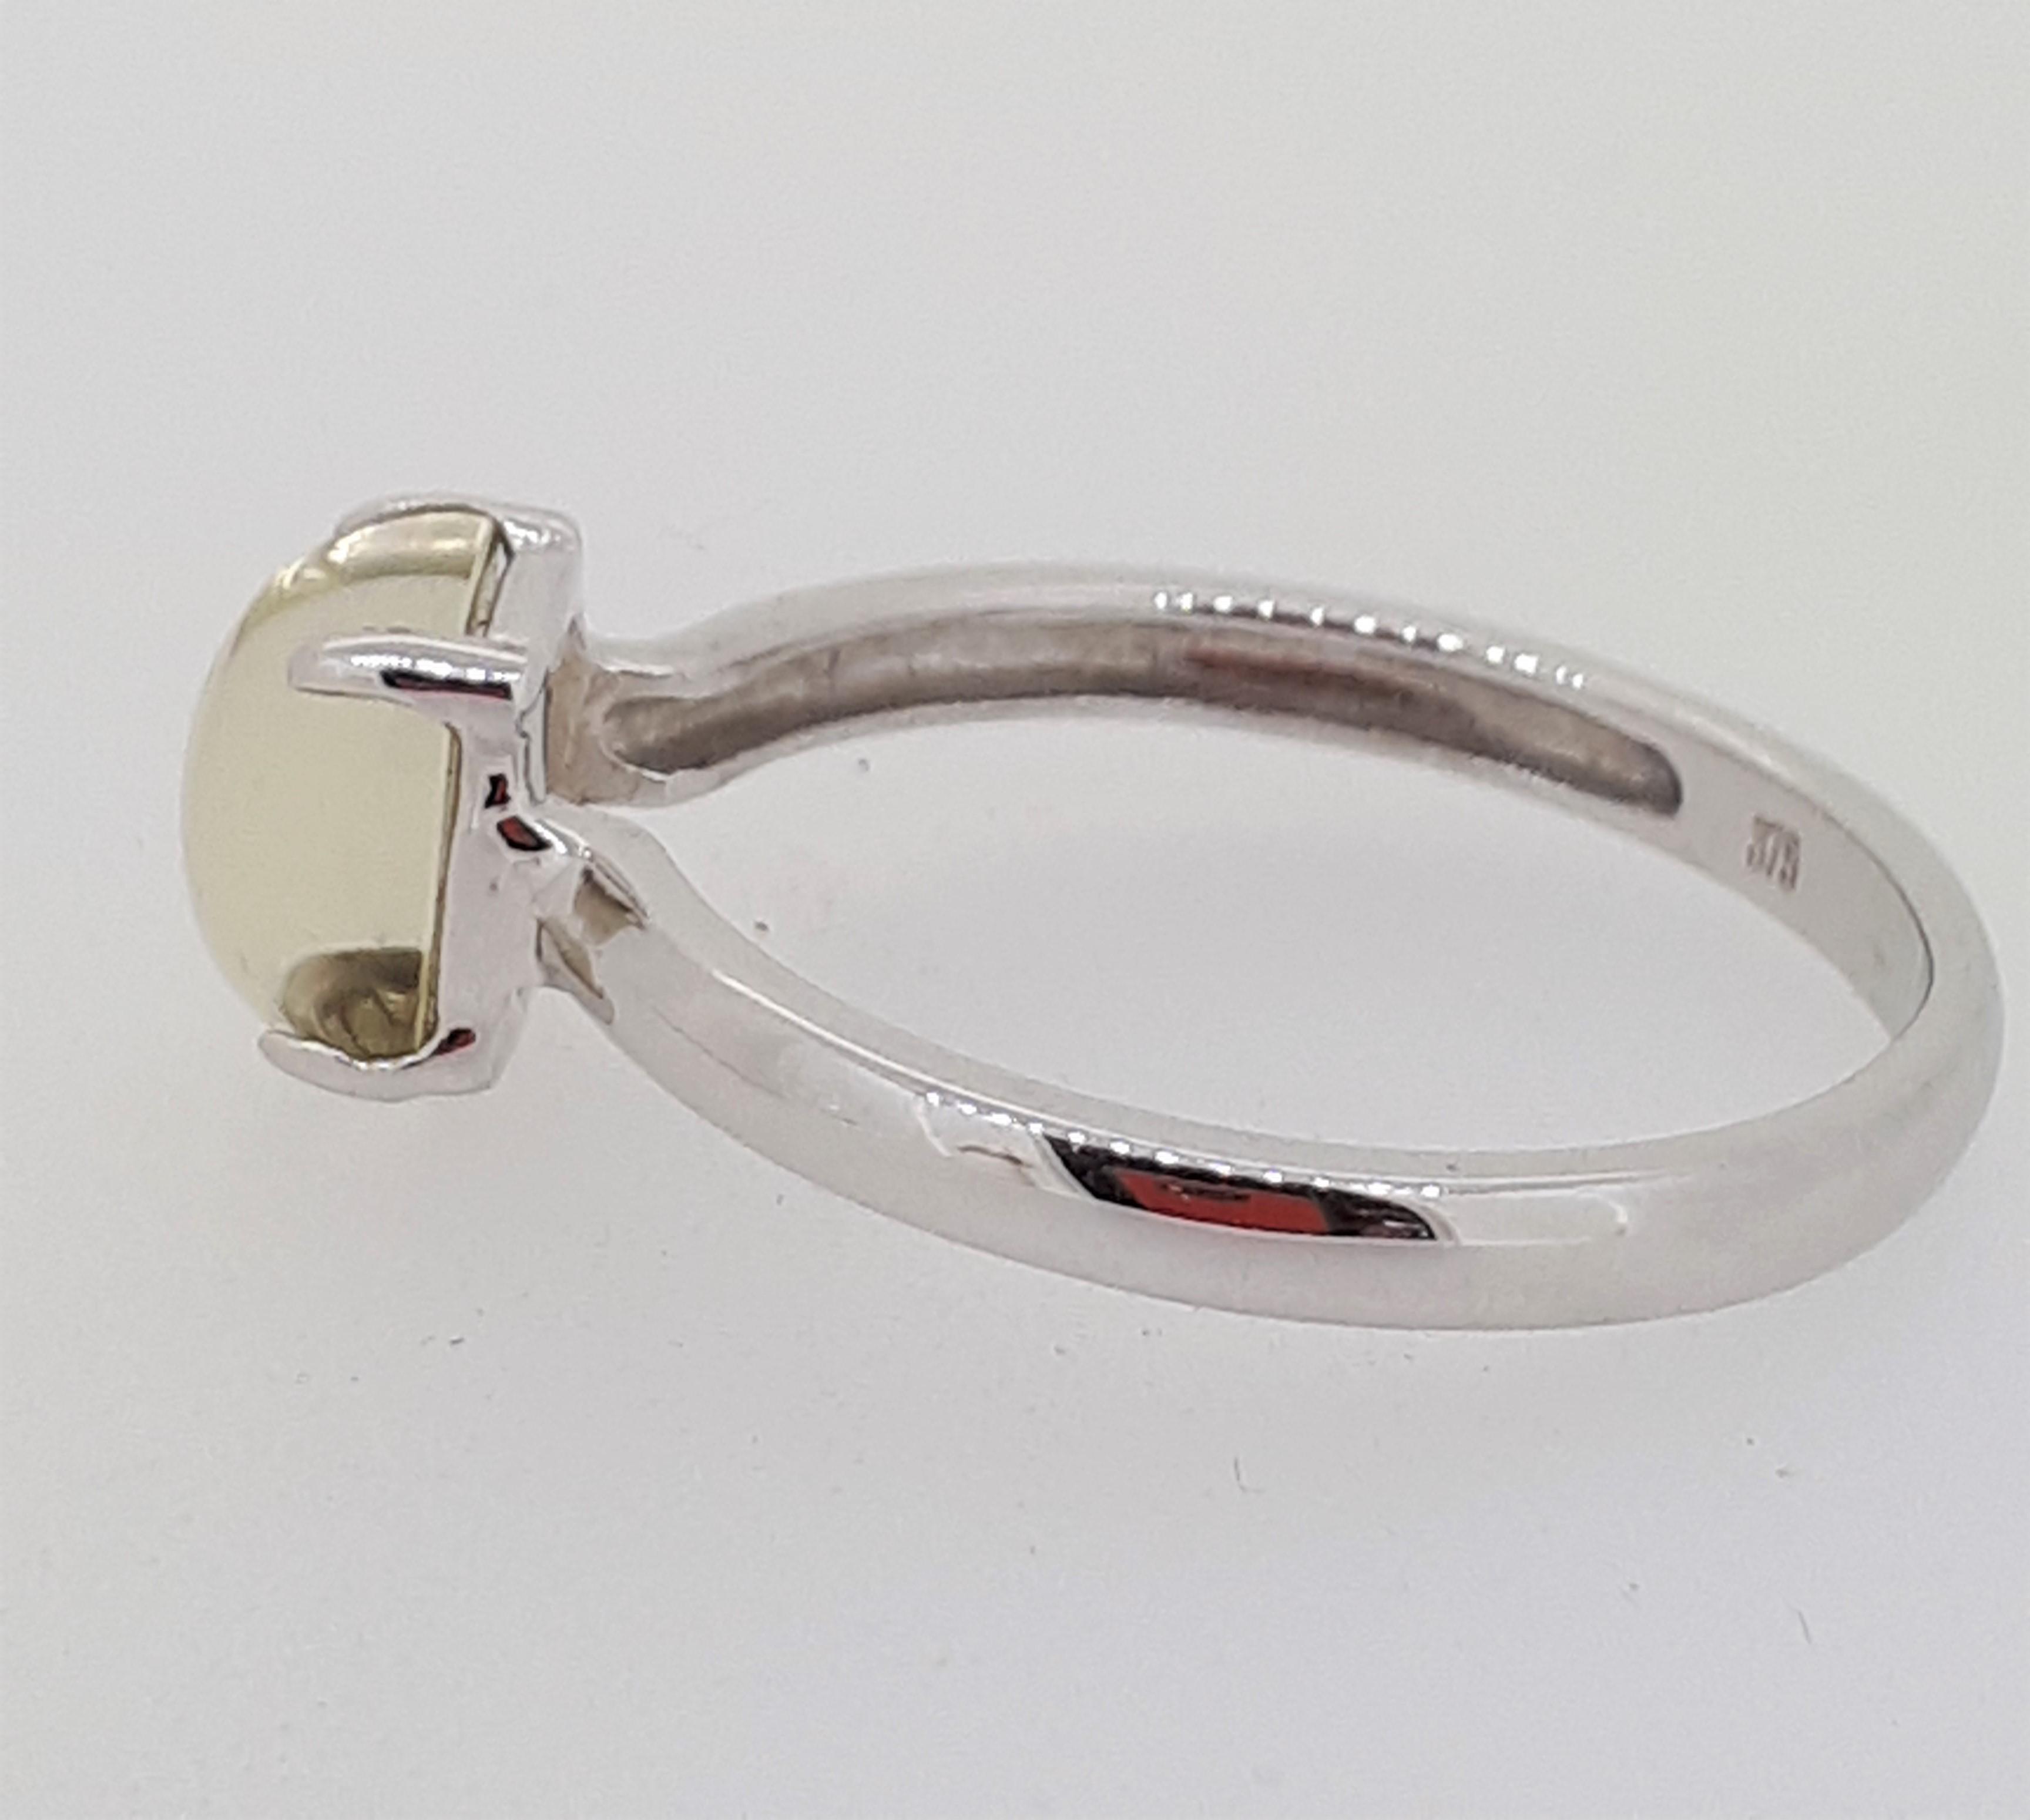 9ct (375) White Gold Lemon Quartz Cabochon Four Claw Ring - Image 3 of 4